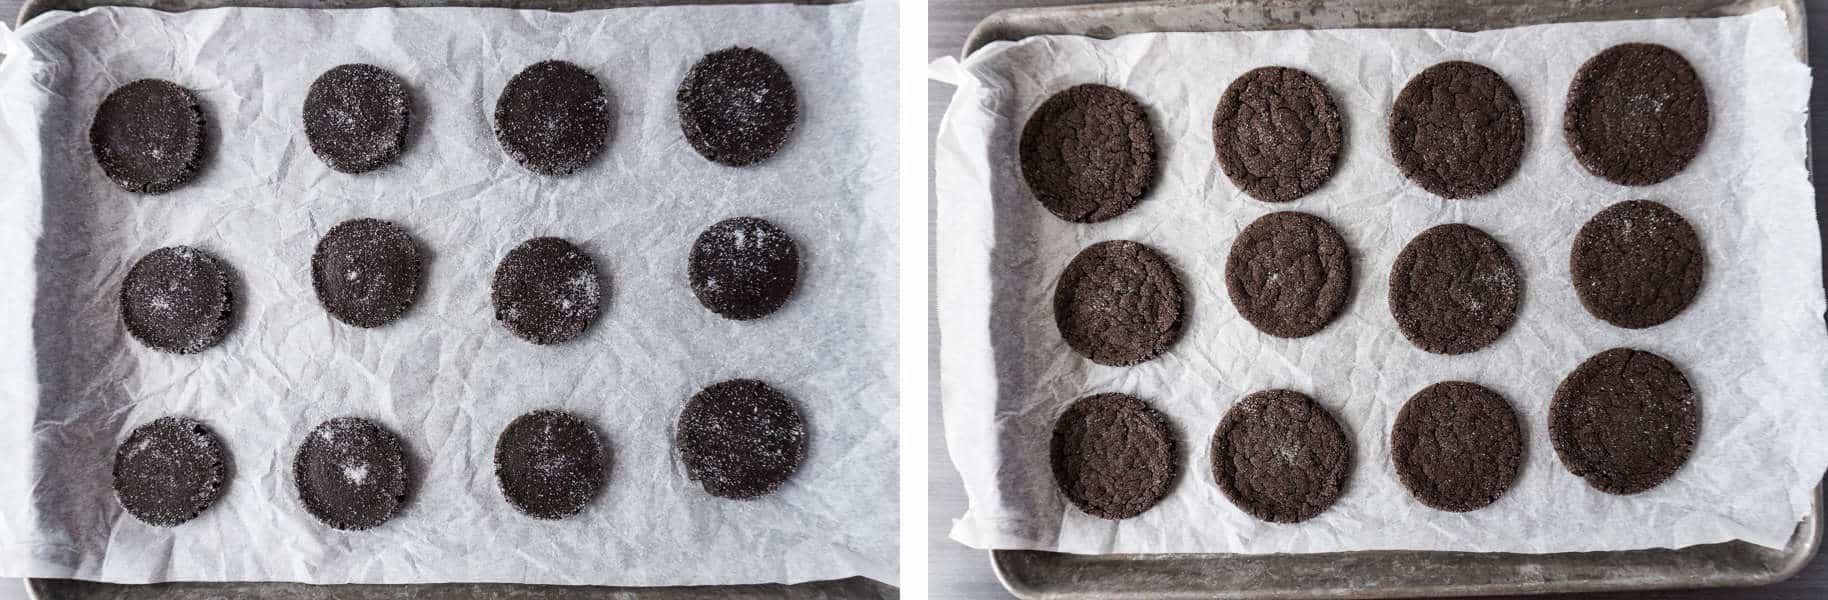 Chocolate Sugar Cookies Step 3 and Step 4